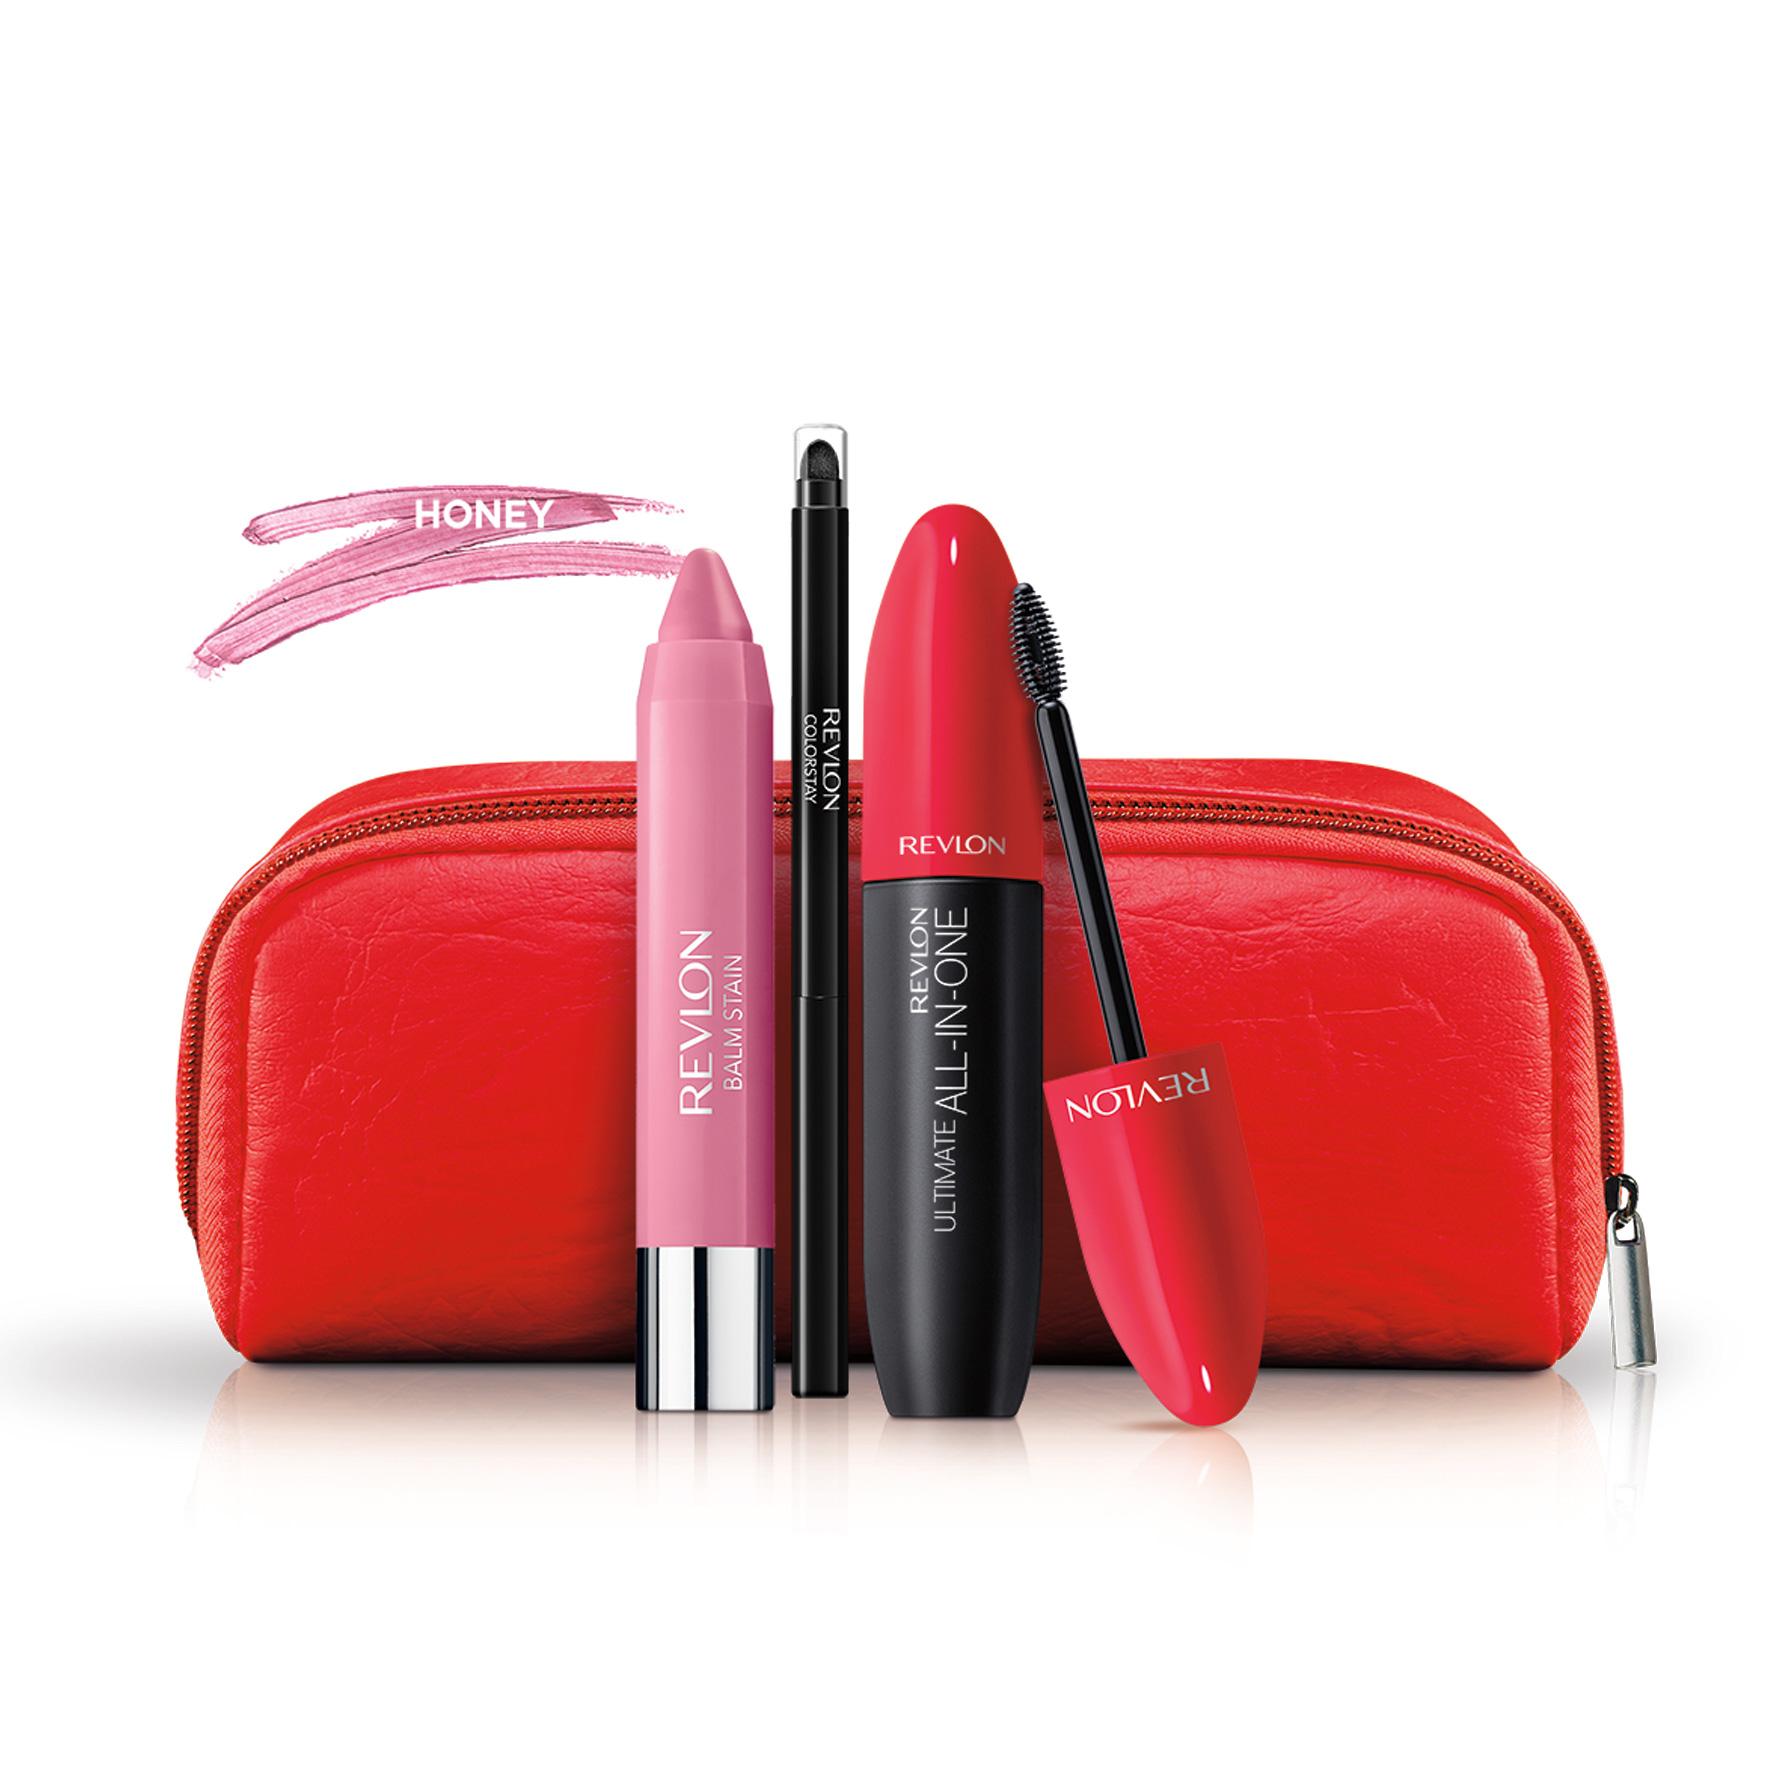 revlon_cosmetics_WRLC061700.jpg